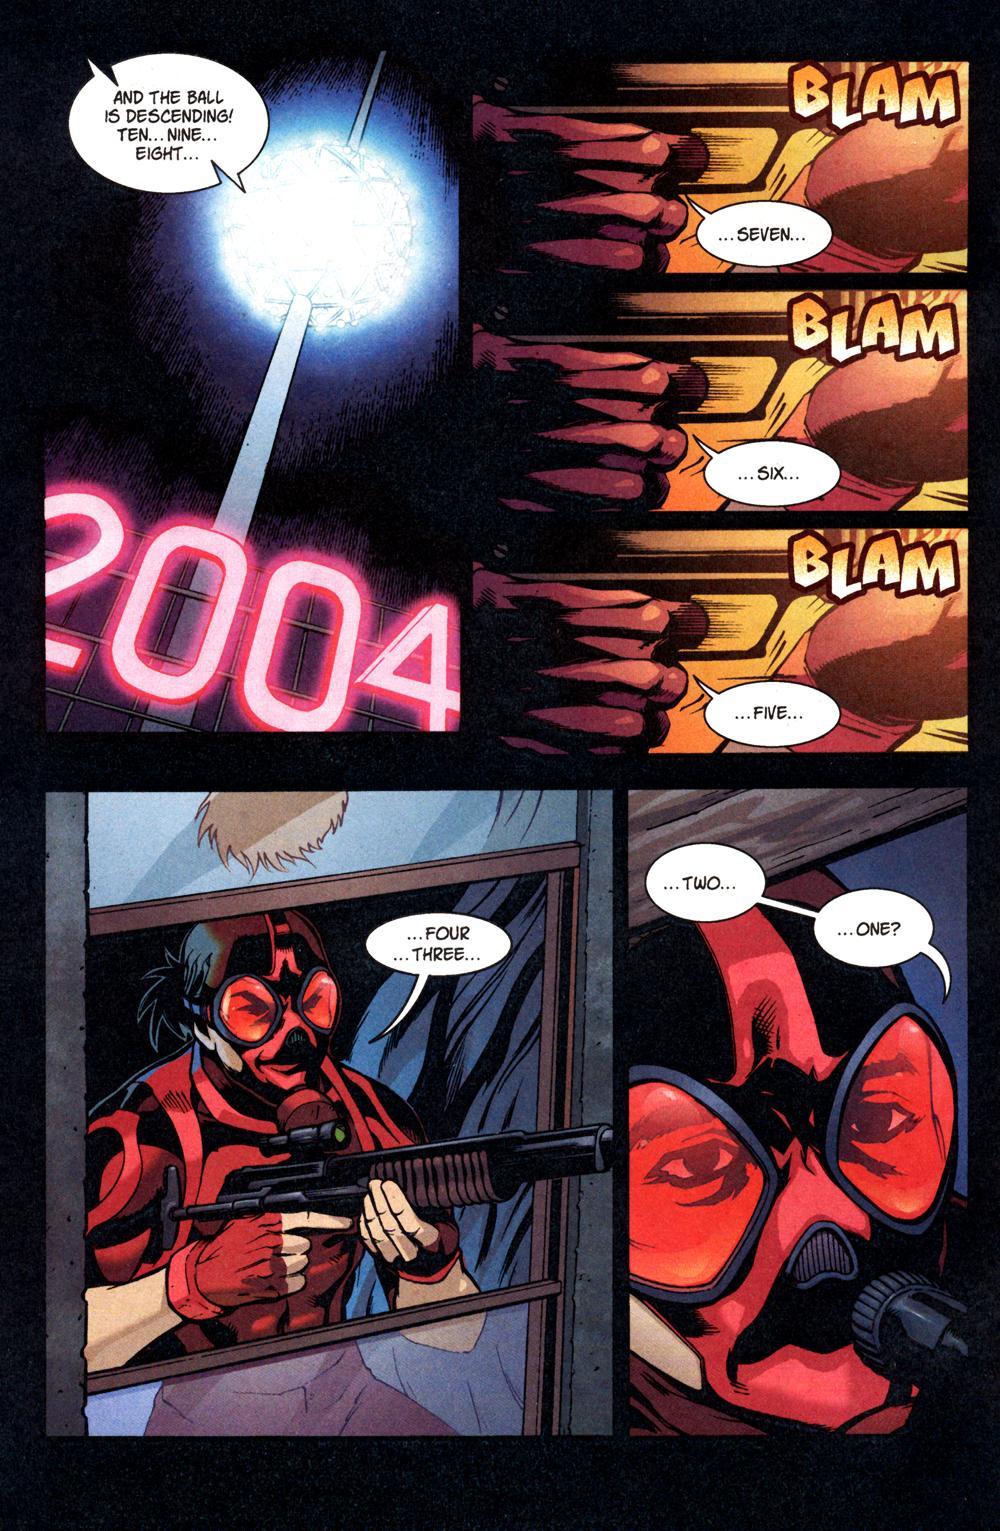 Read online SpyBoy: Final Exam comic -  Issue #1 - 4